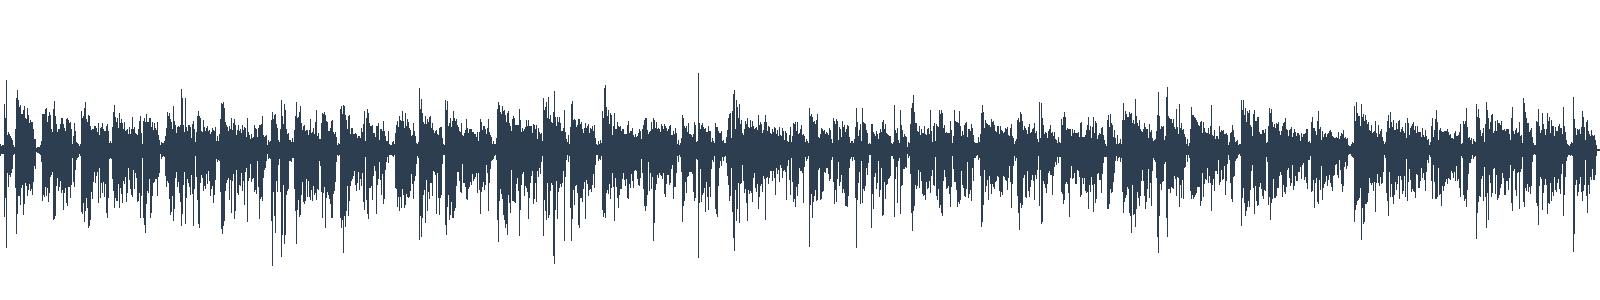 Nové audioknihy 18/2019 waveform